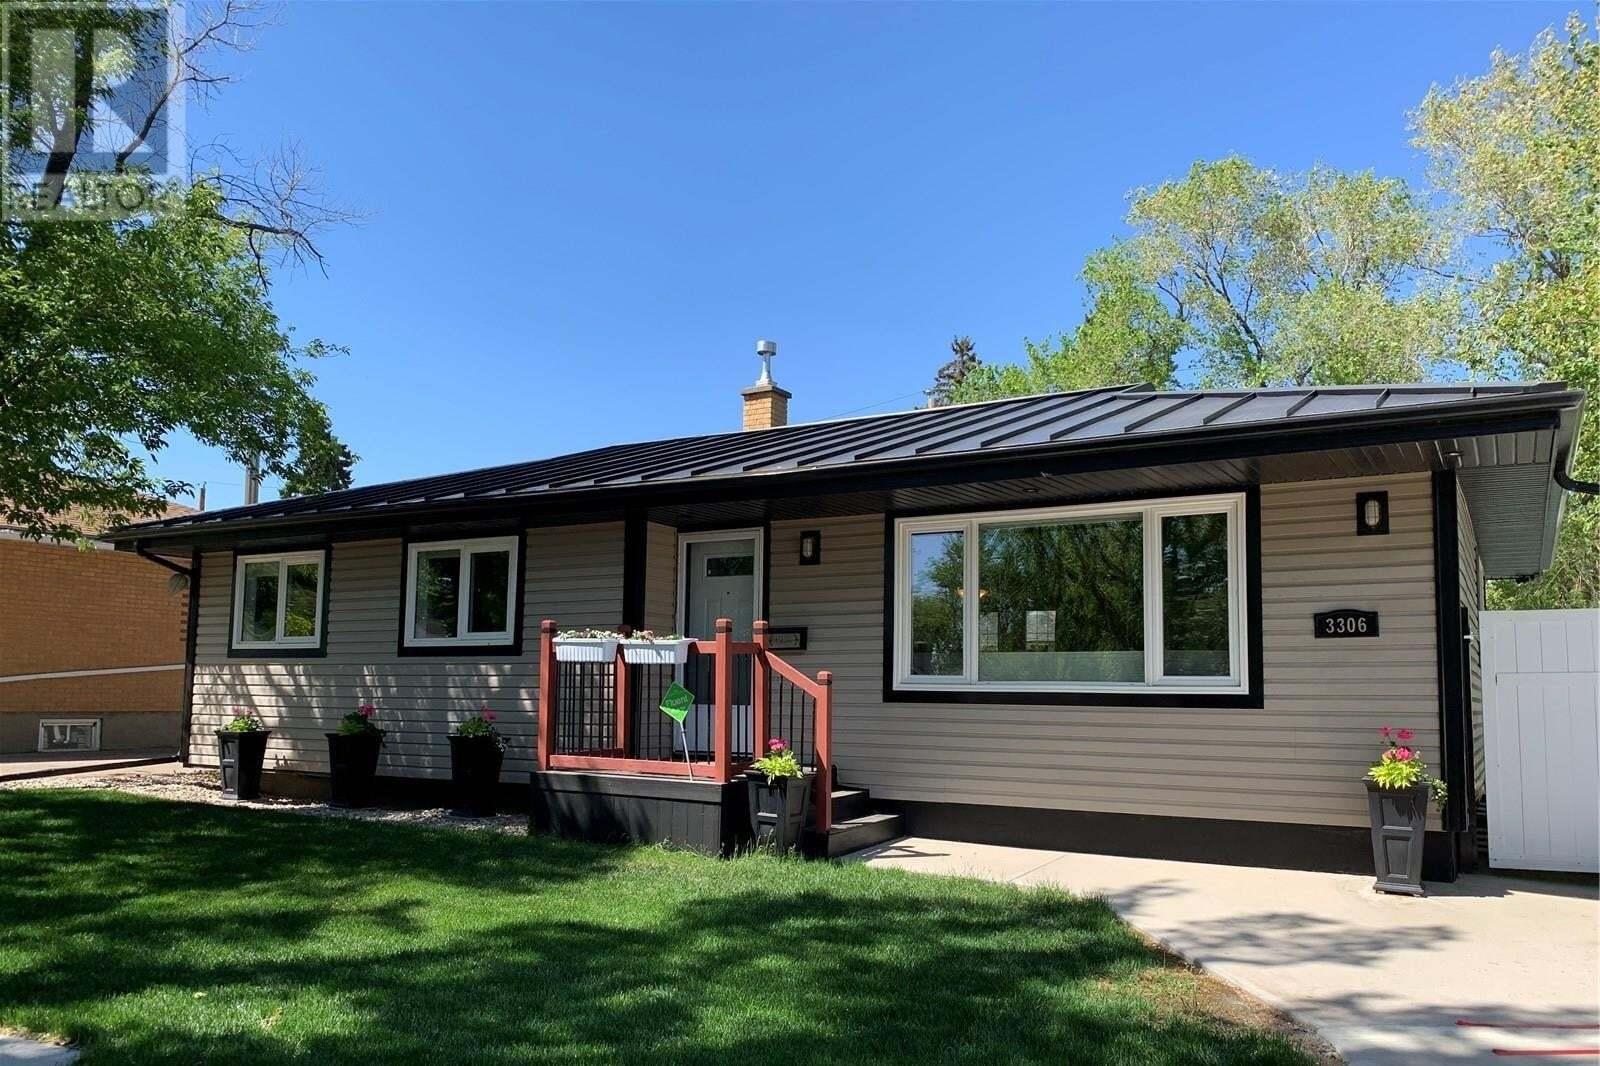 House for sale at 3306 4th Ave N Regina Saskatchewan - MLS: SK810544